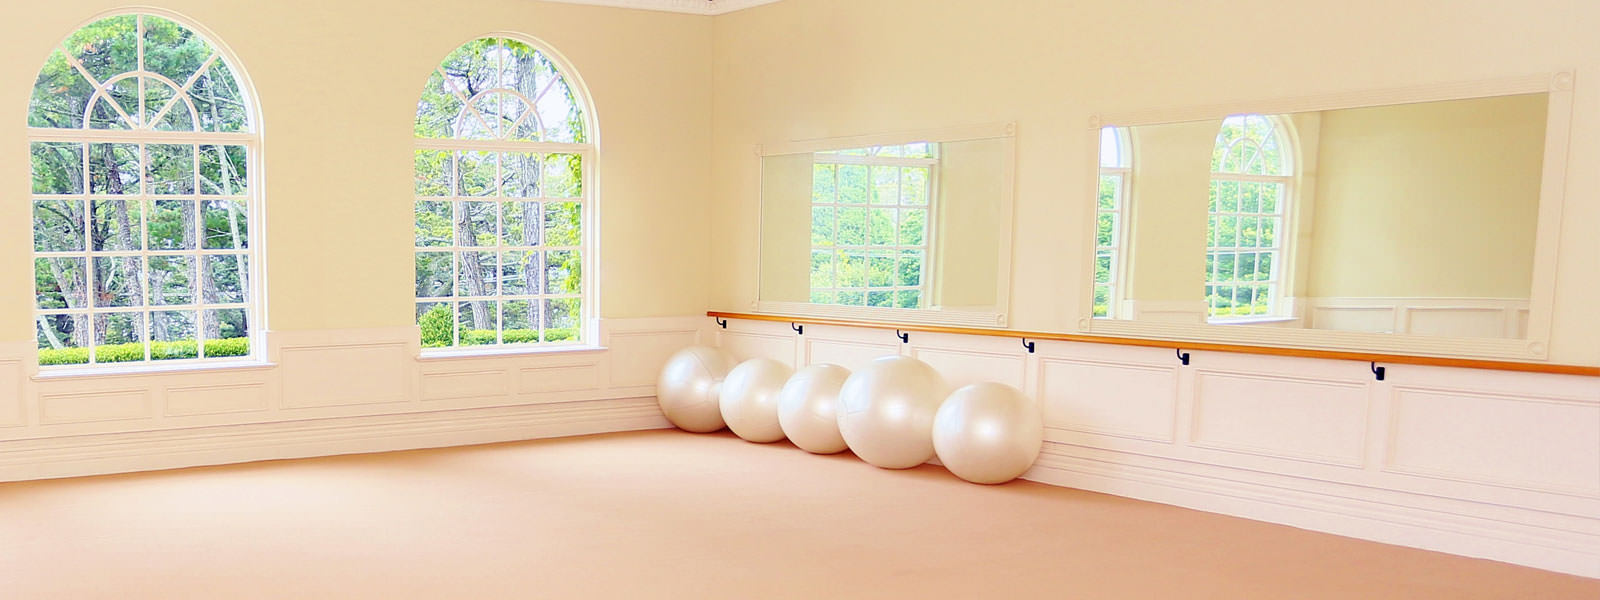 milton-park-fitness-room.jpg